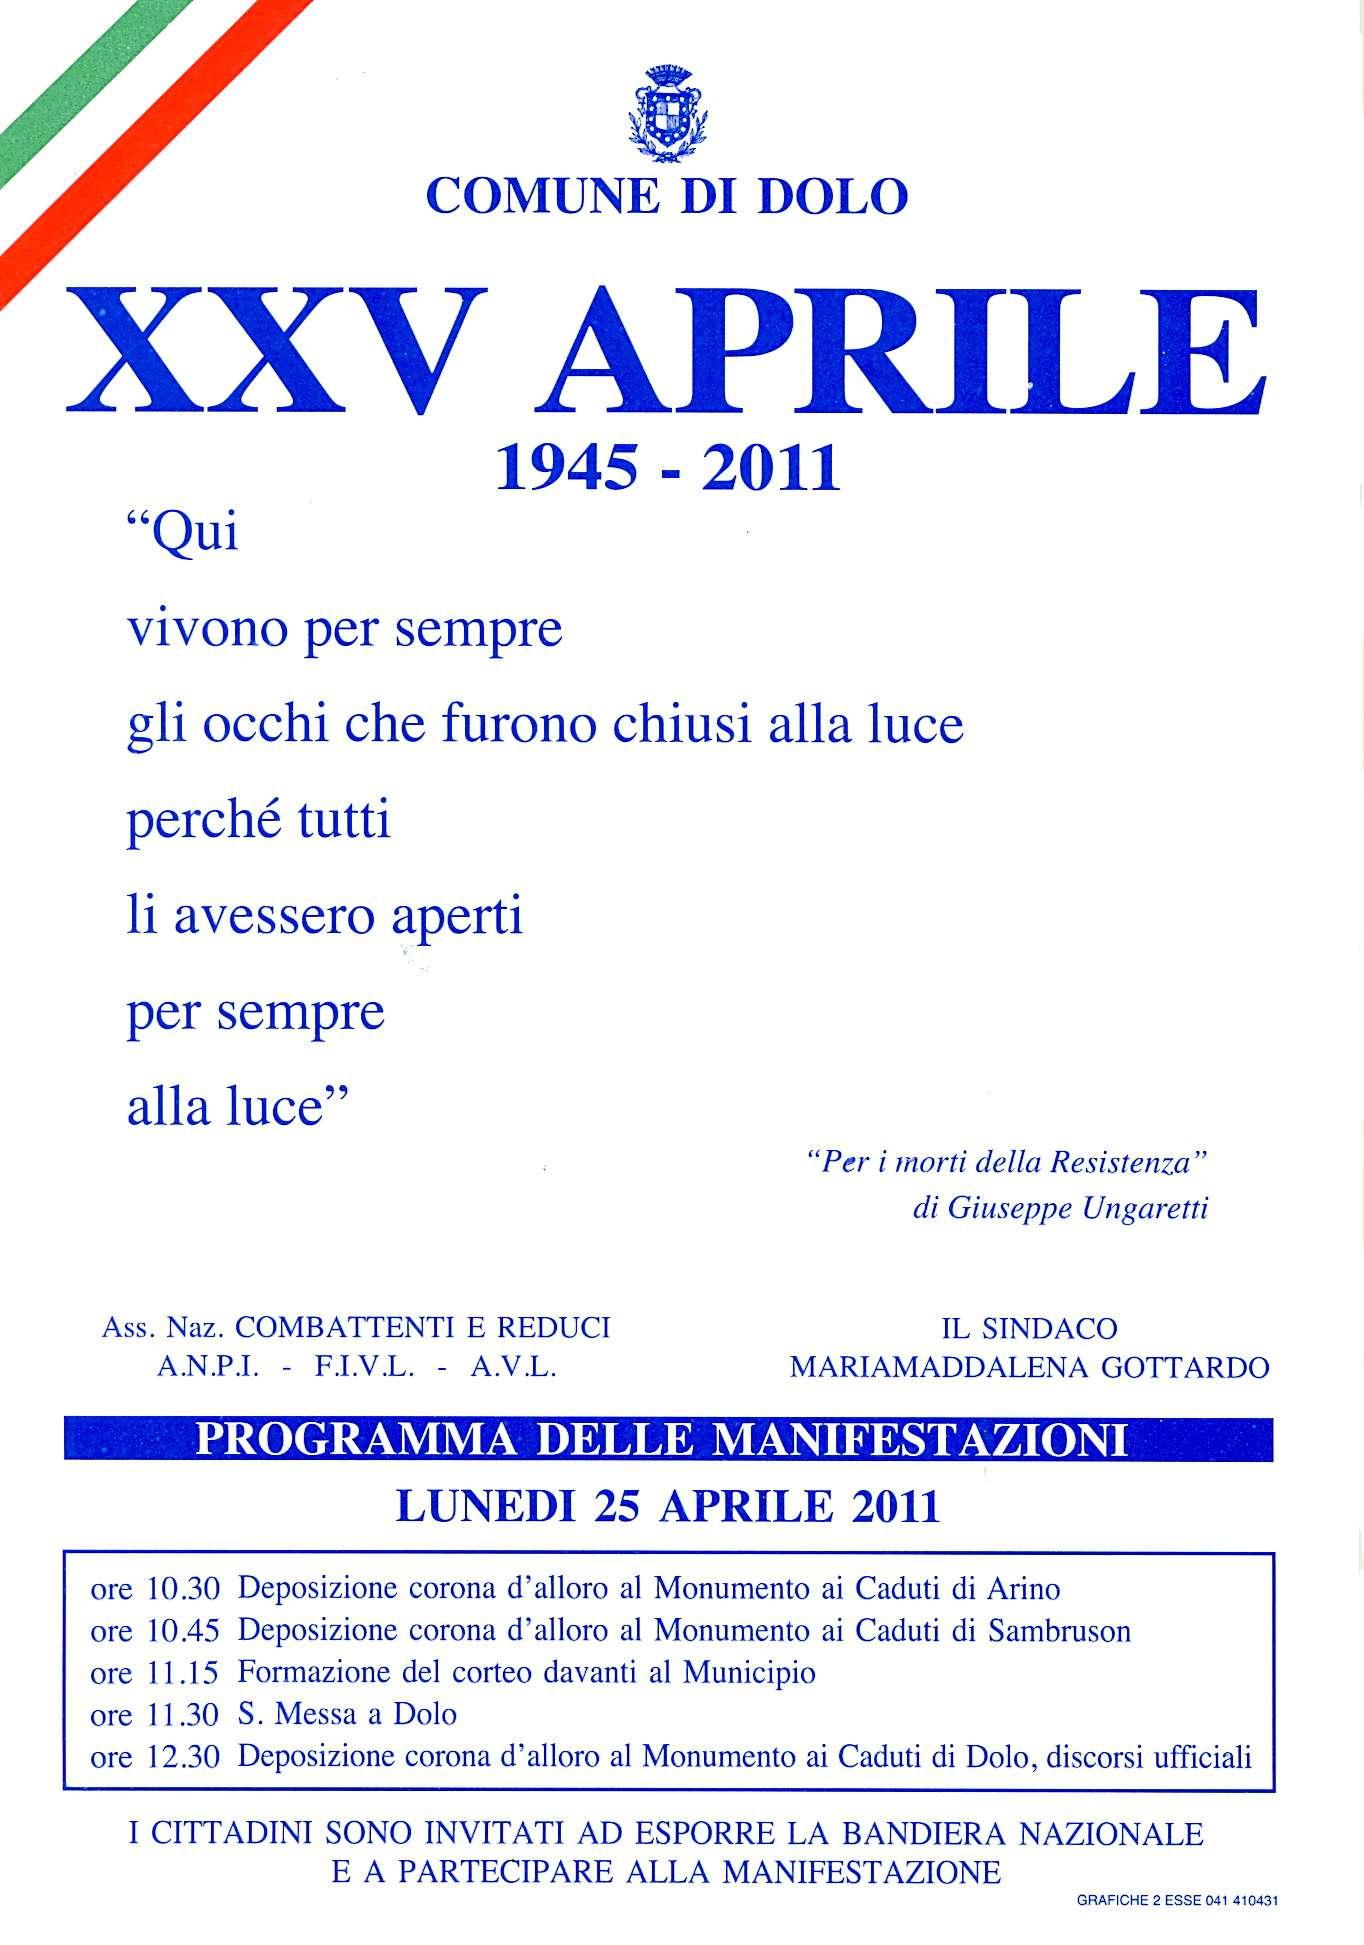 XXV Aprile.jpg